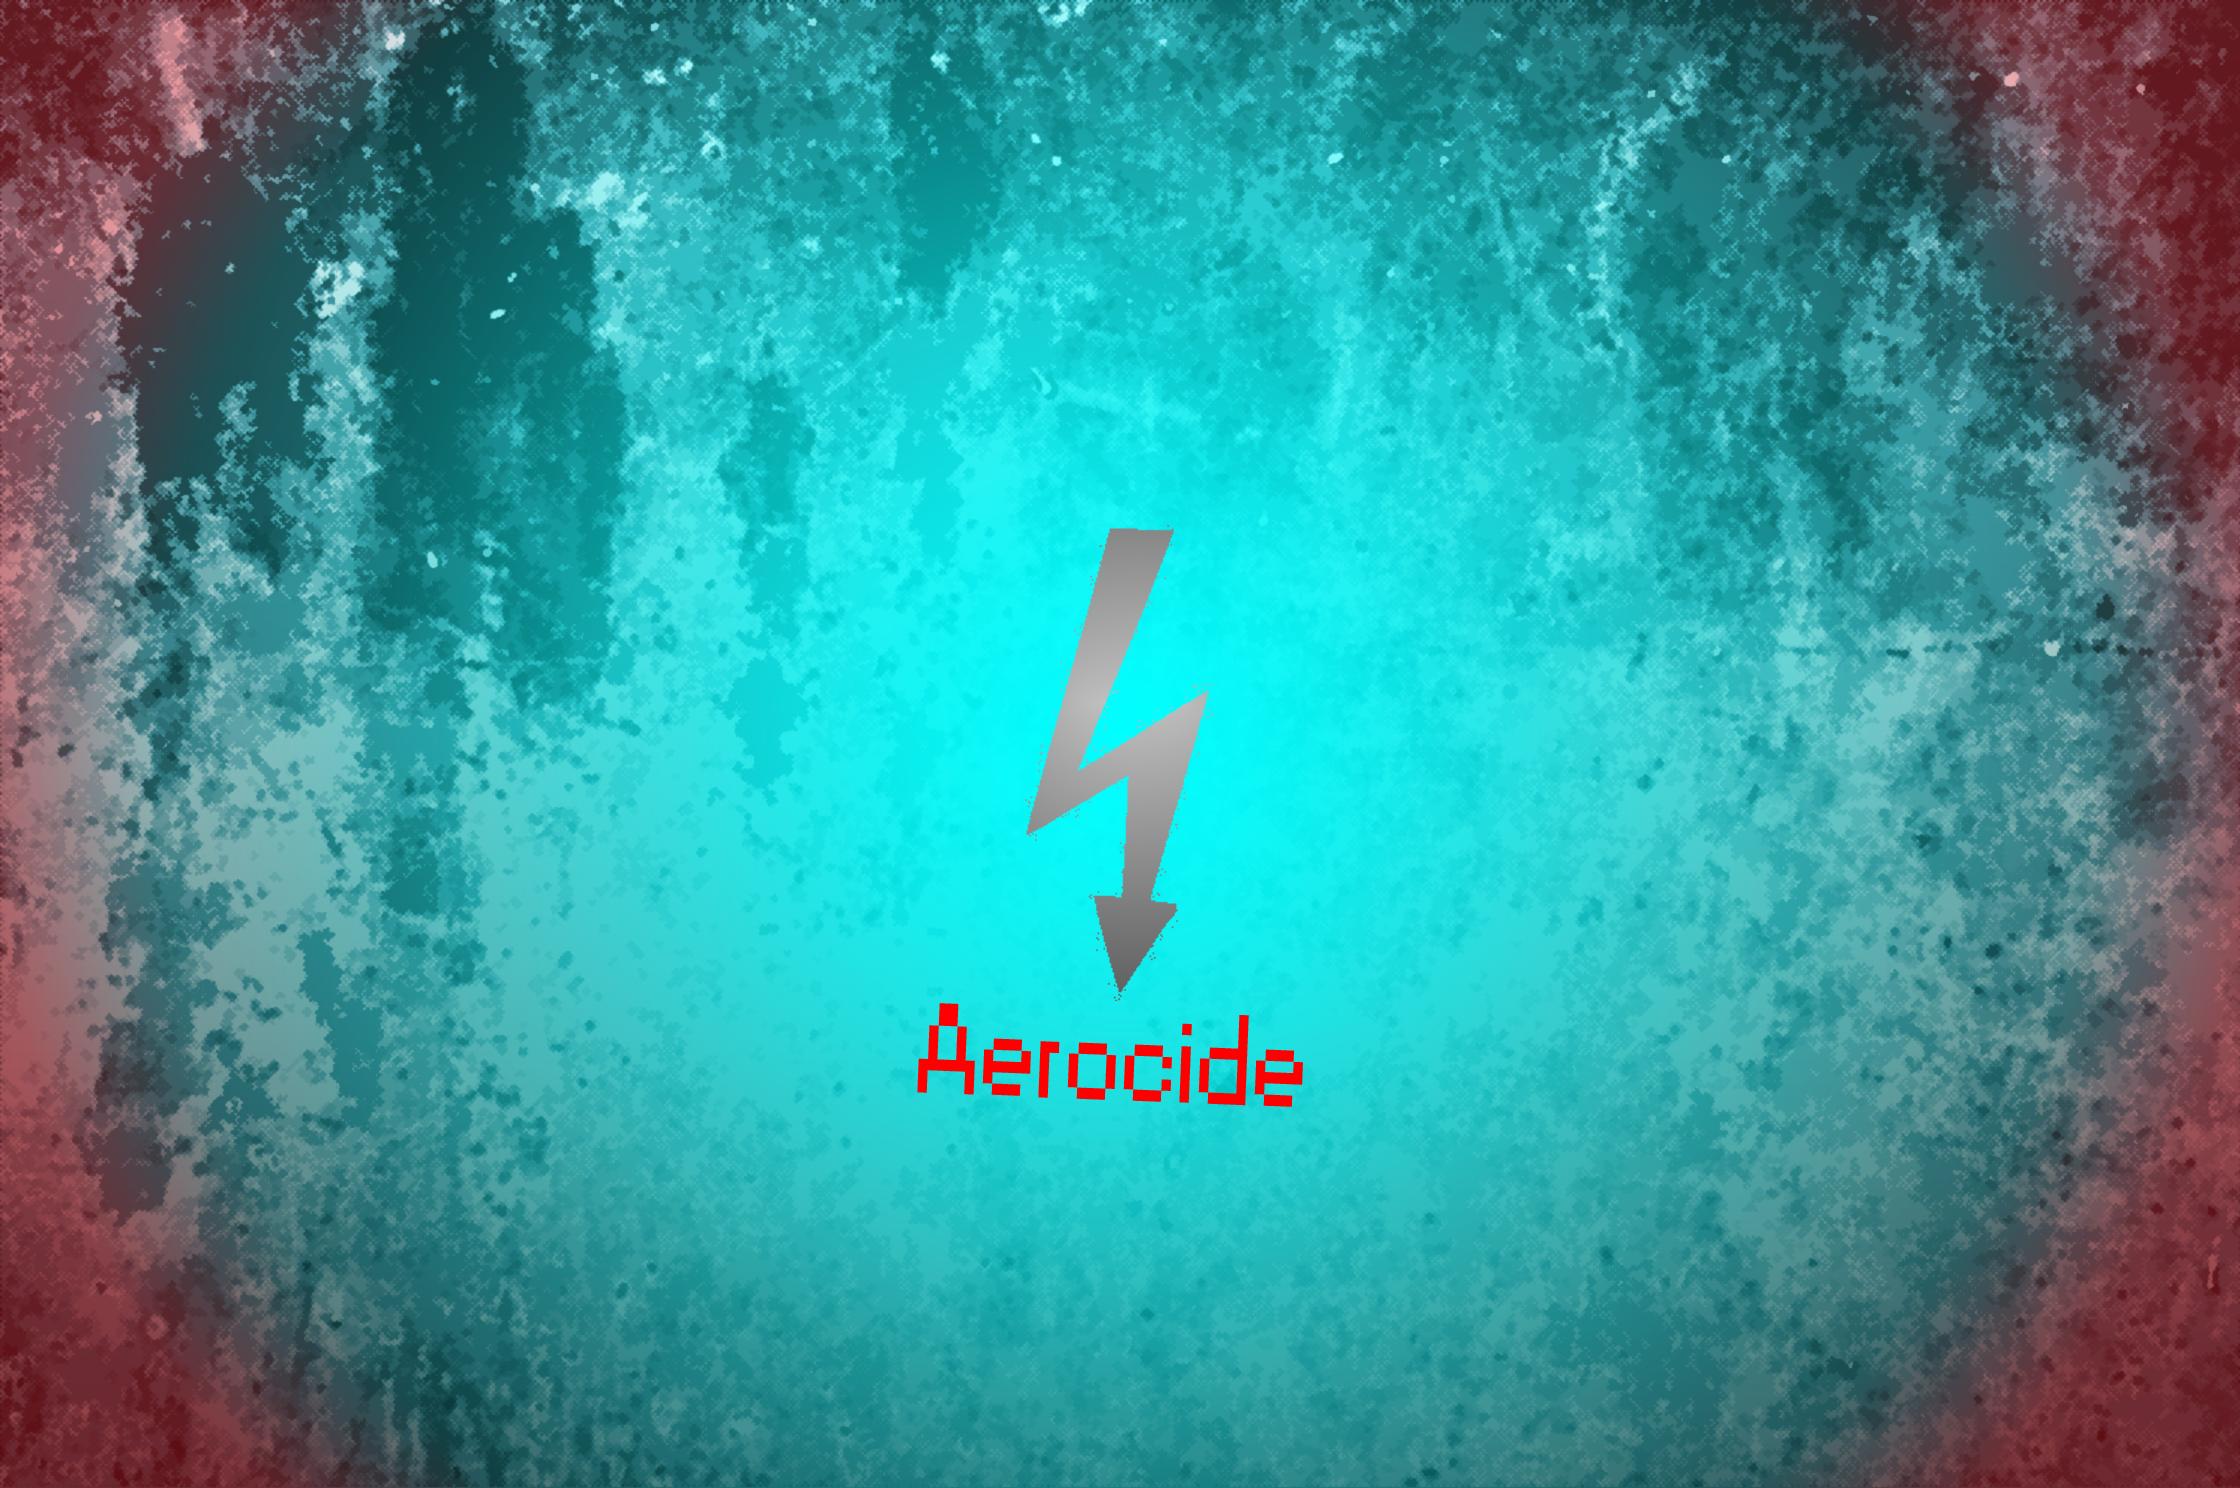 Aerocide deskop background